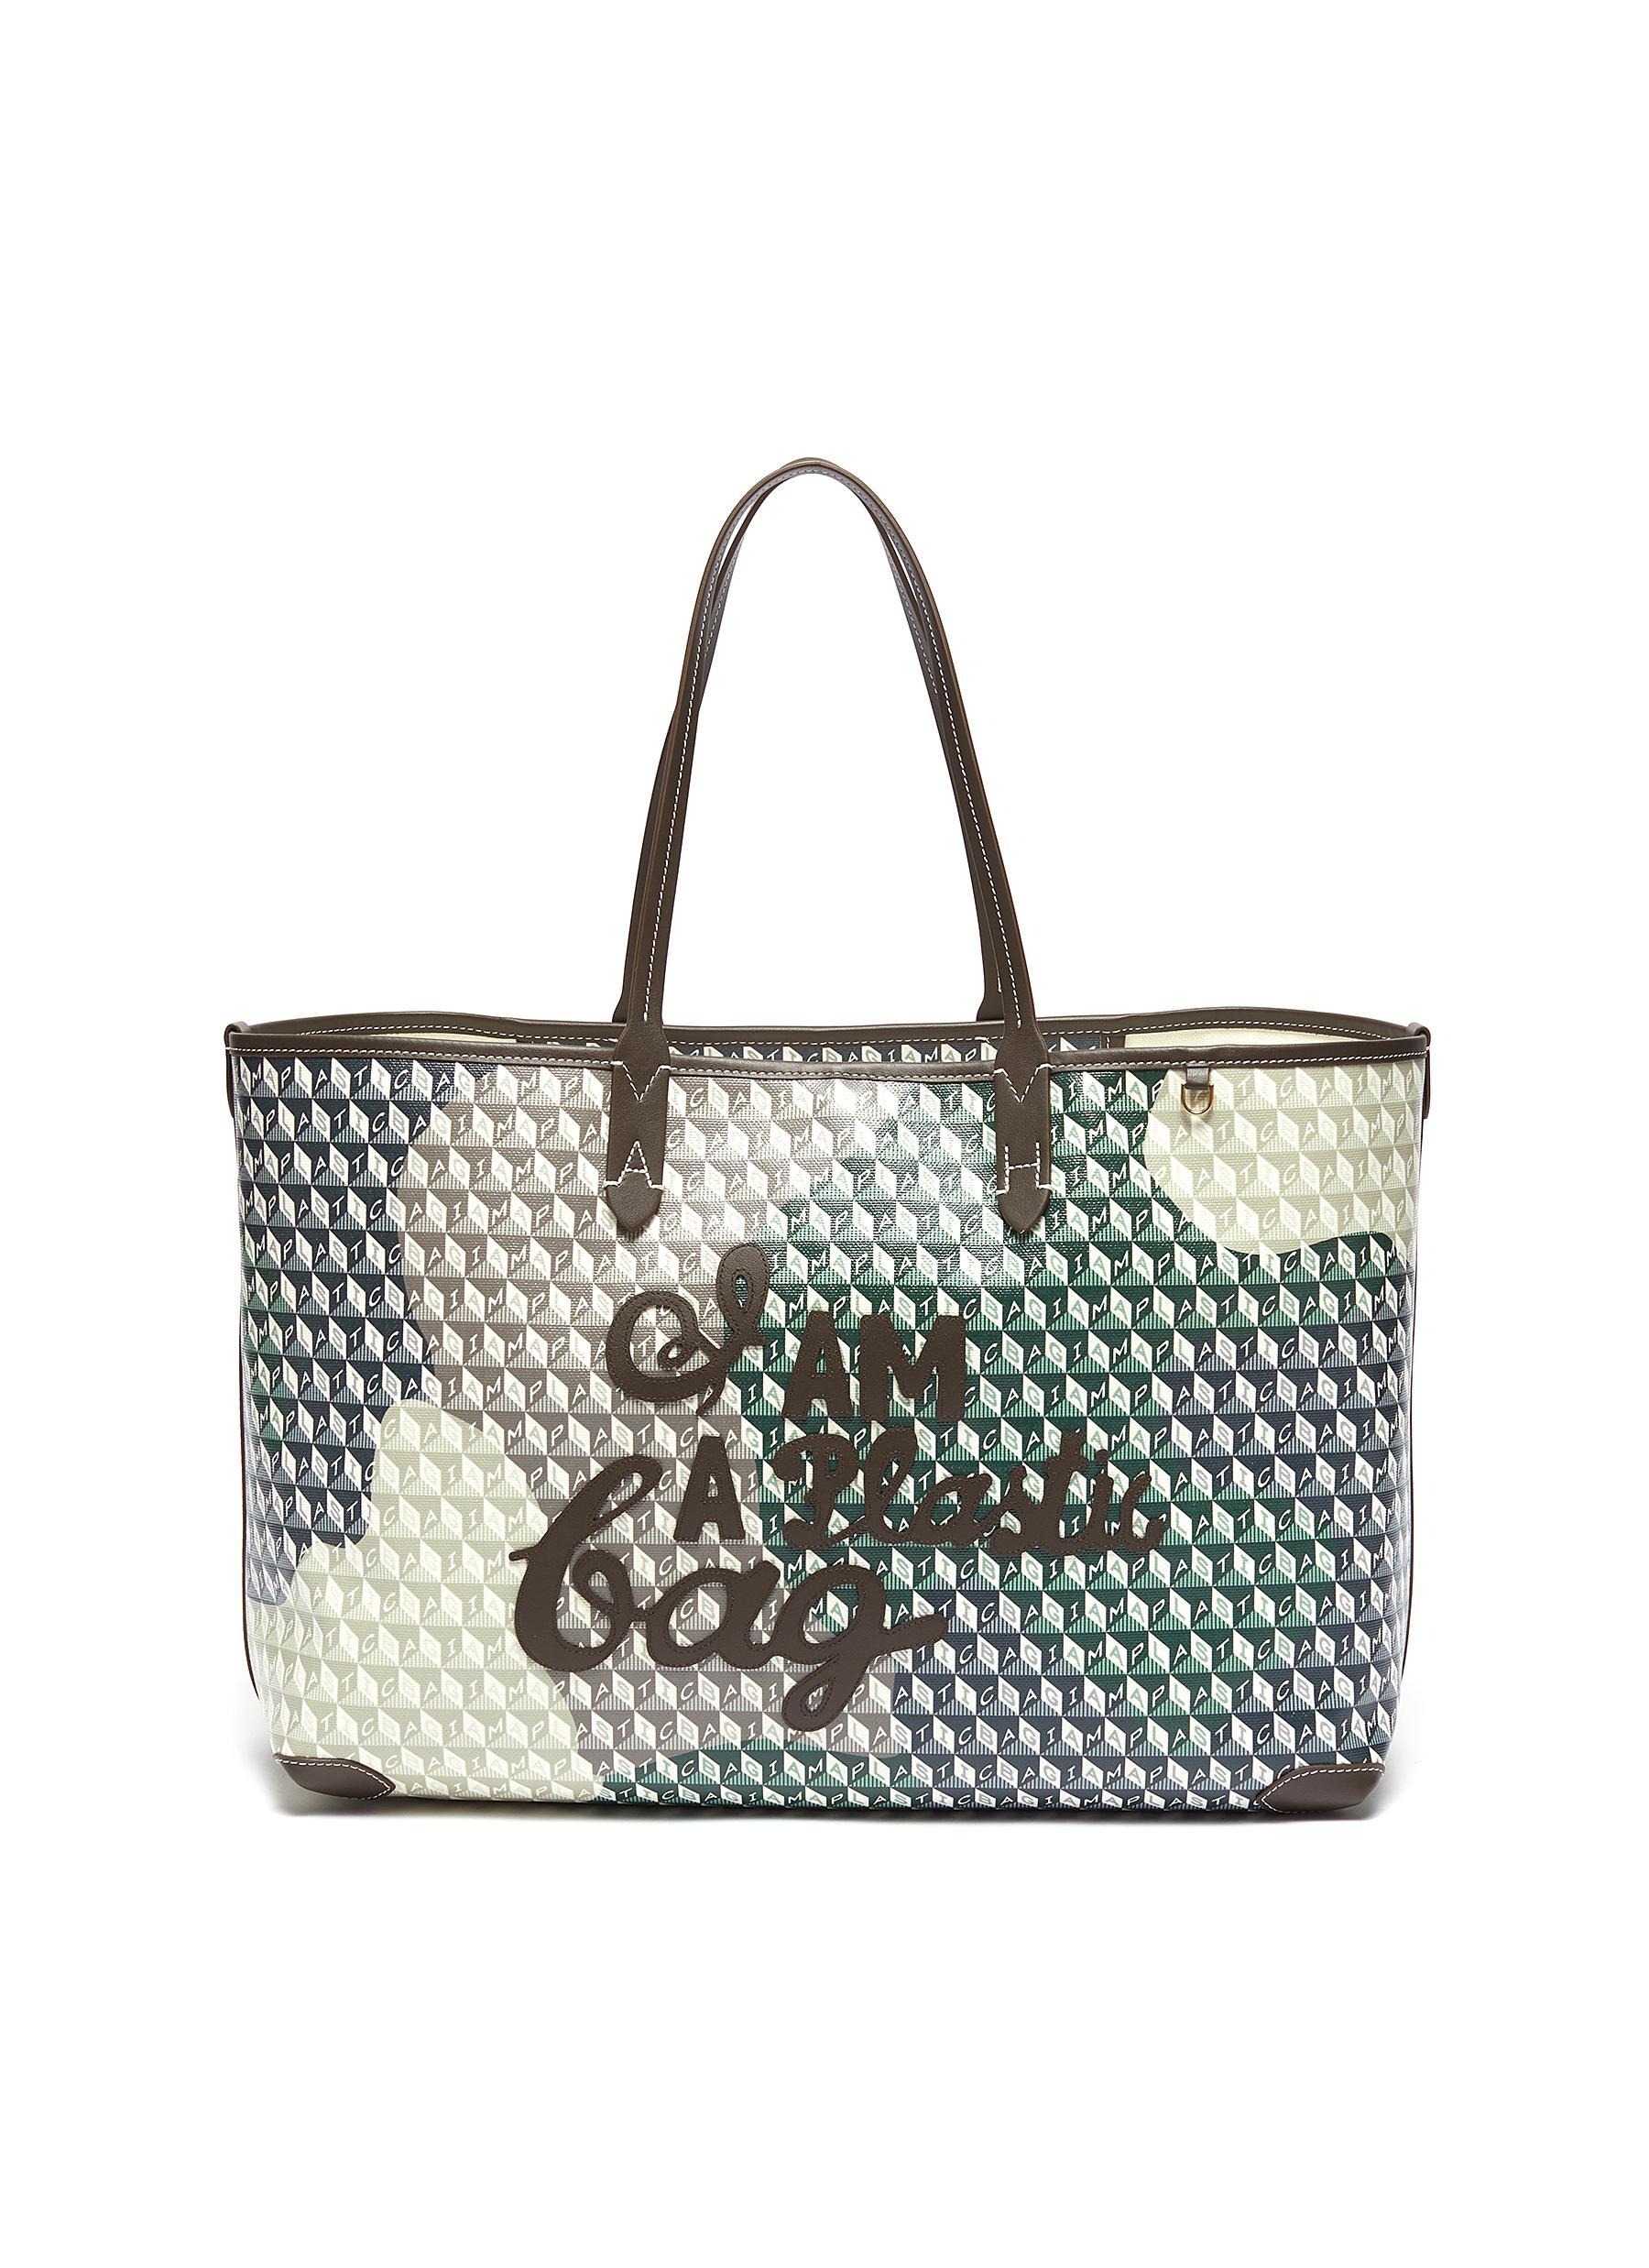 I Am A Plastic Bag' Logo Camouflage Recycle Canvas Tote - ANYA HINDMARCH - Modalova